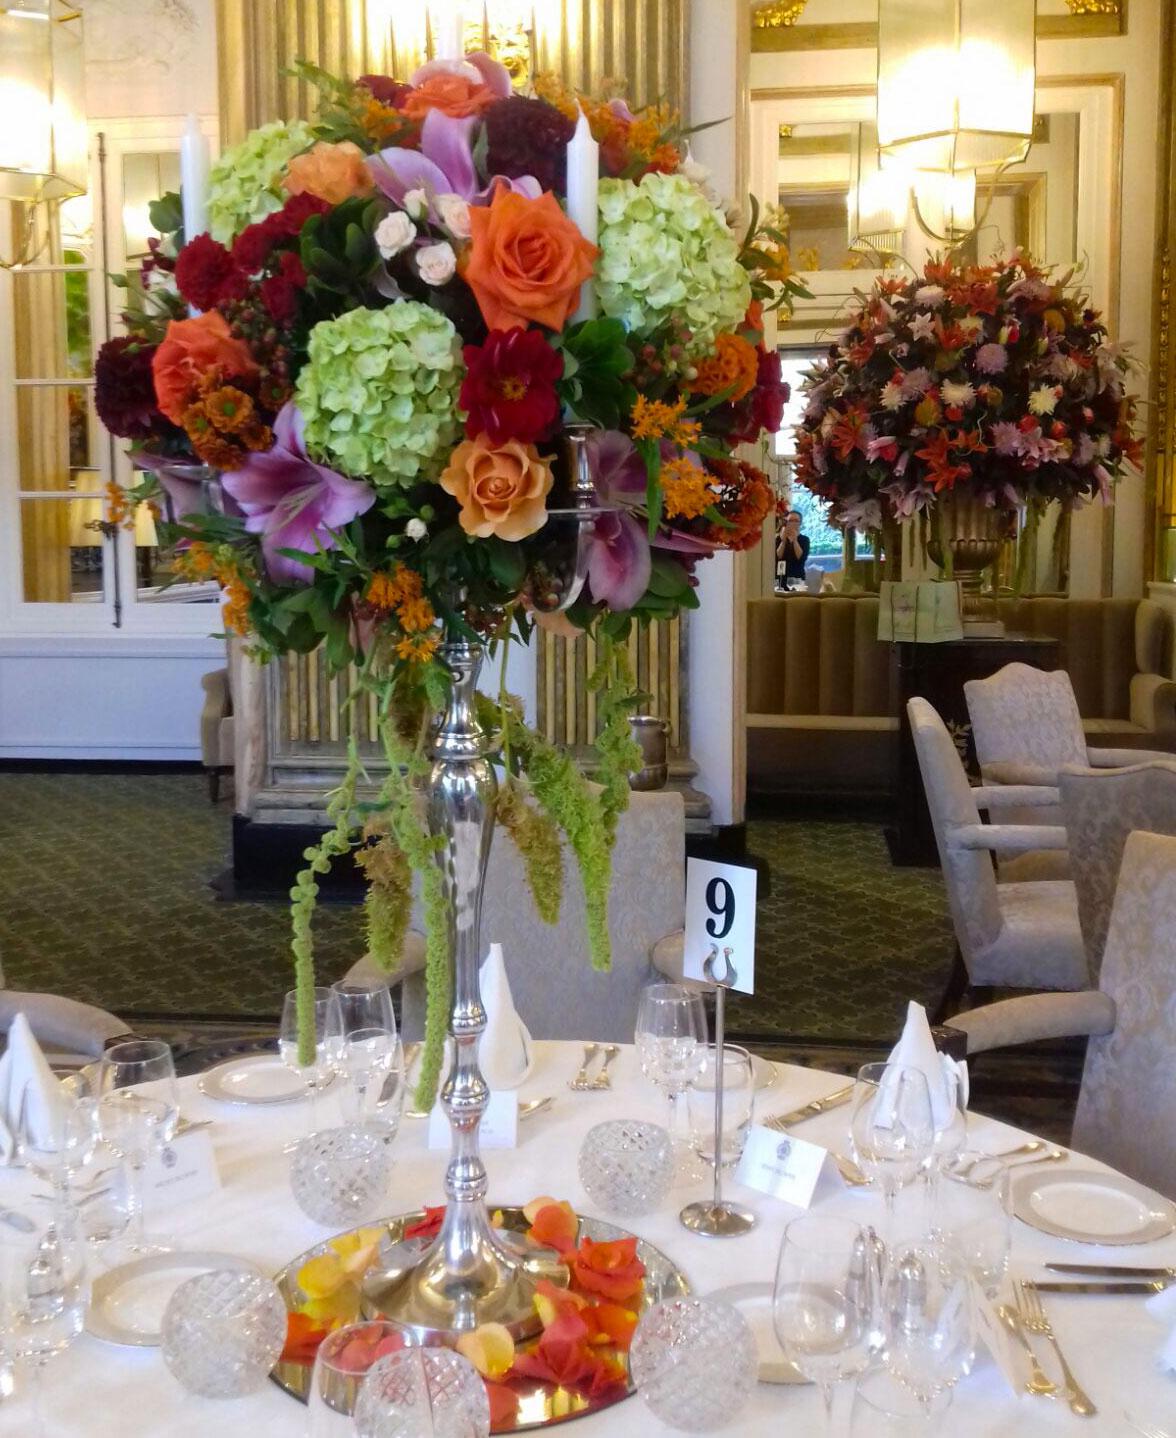 moyses-stevens-corporate-floral-arrangement.jpg